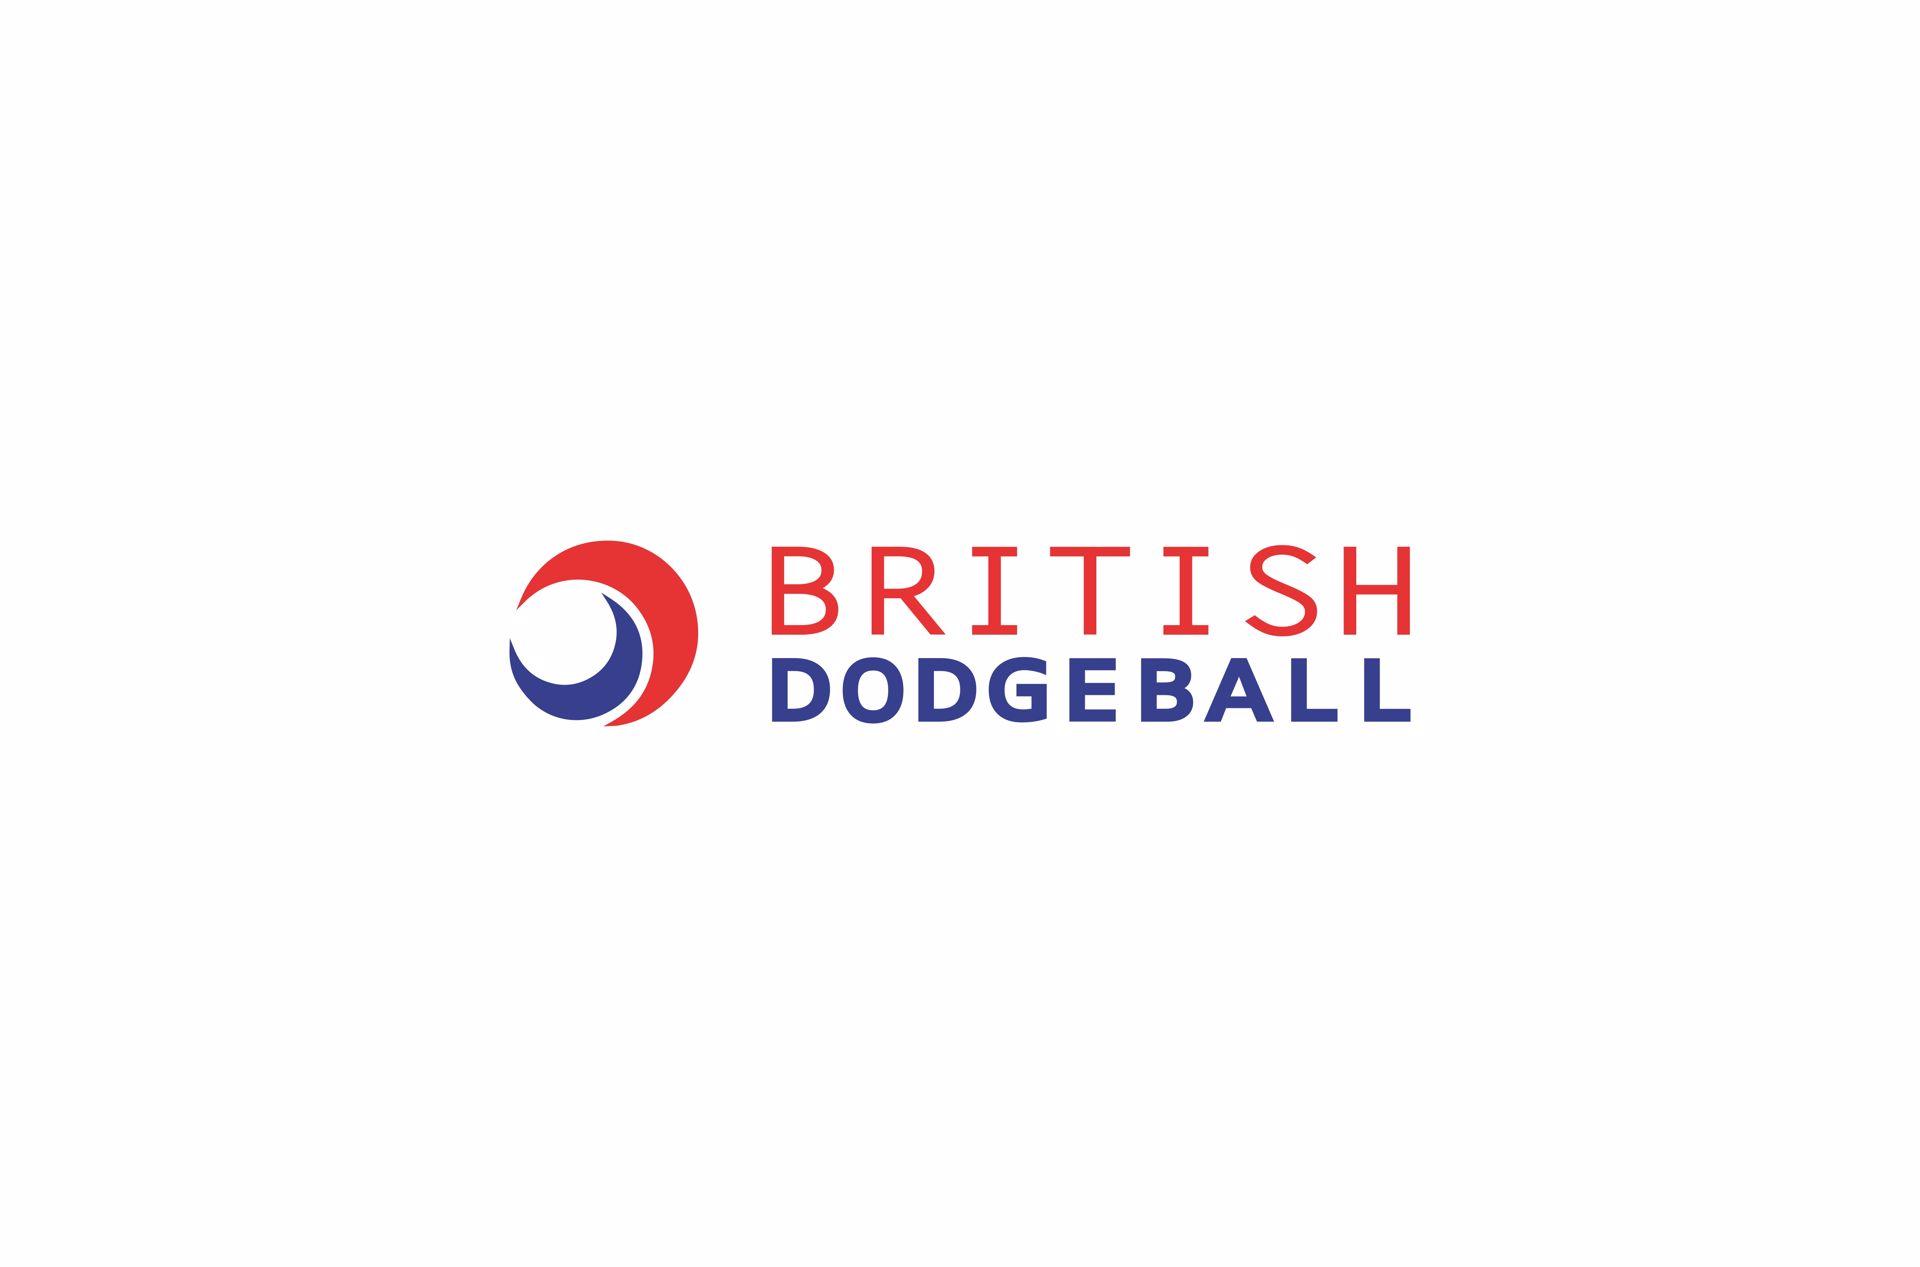 Club Image for British Dodgeball